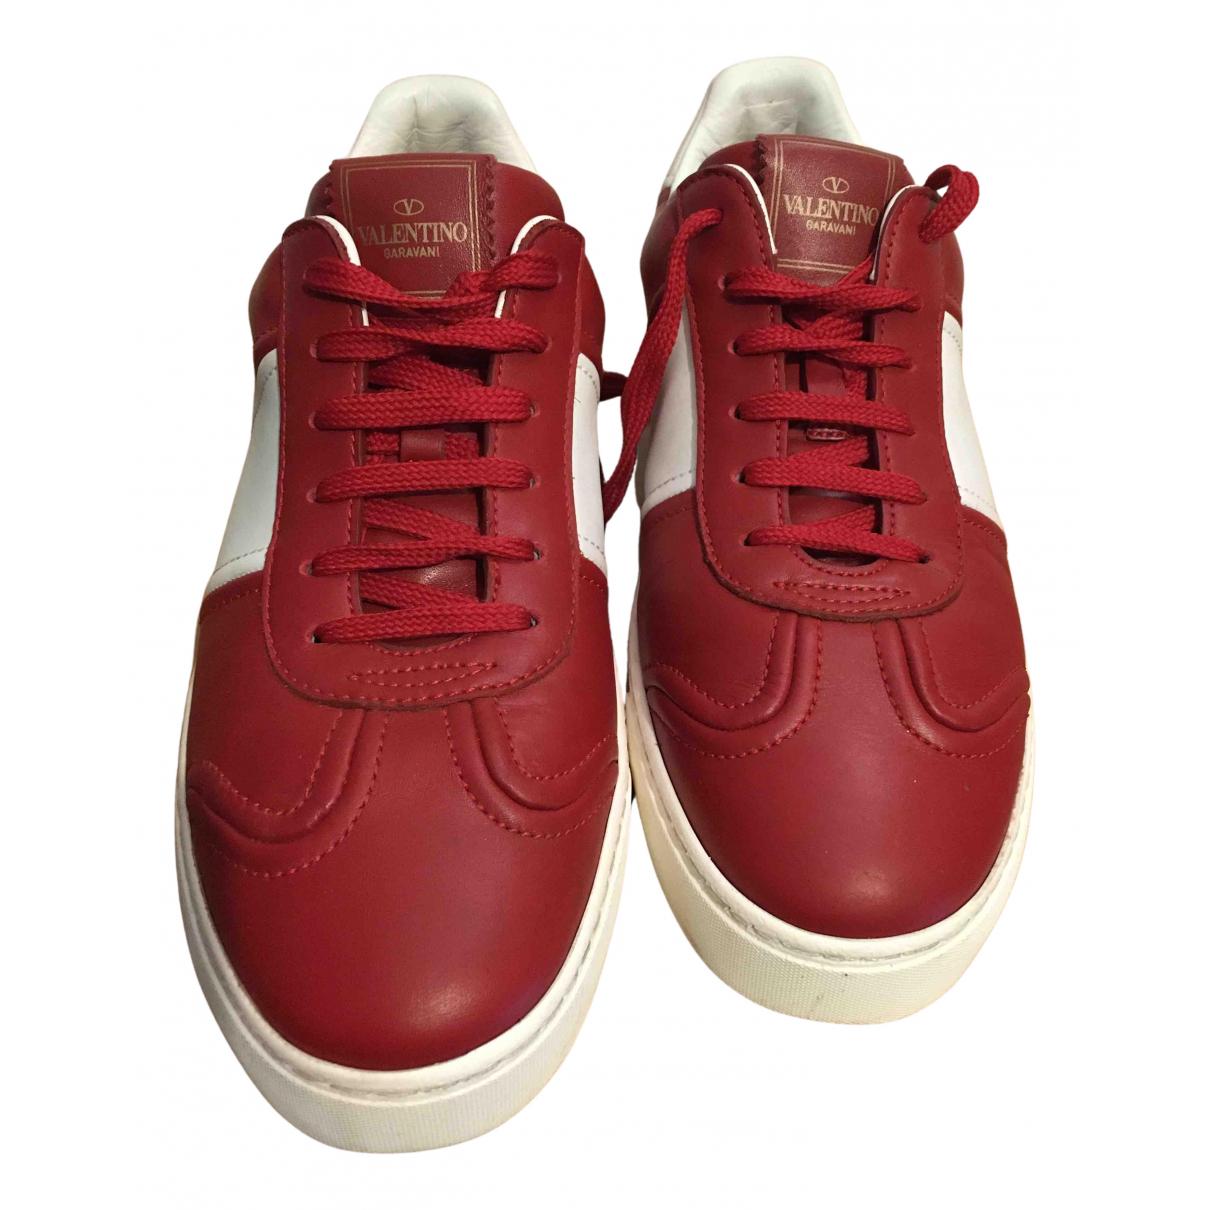 Valentino Garavani Rockstud Red Leather Trainers for Women 40 EU